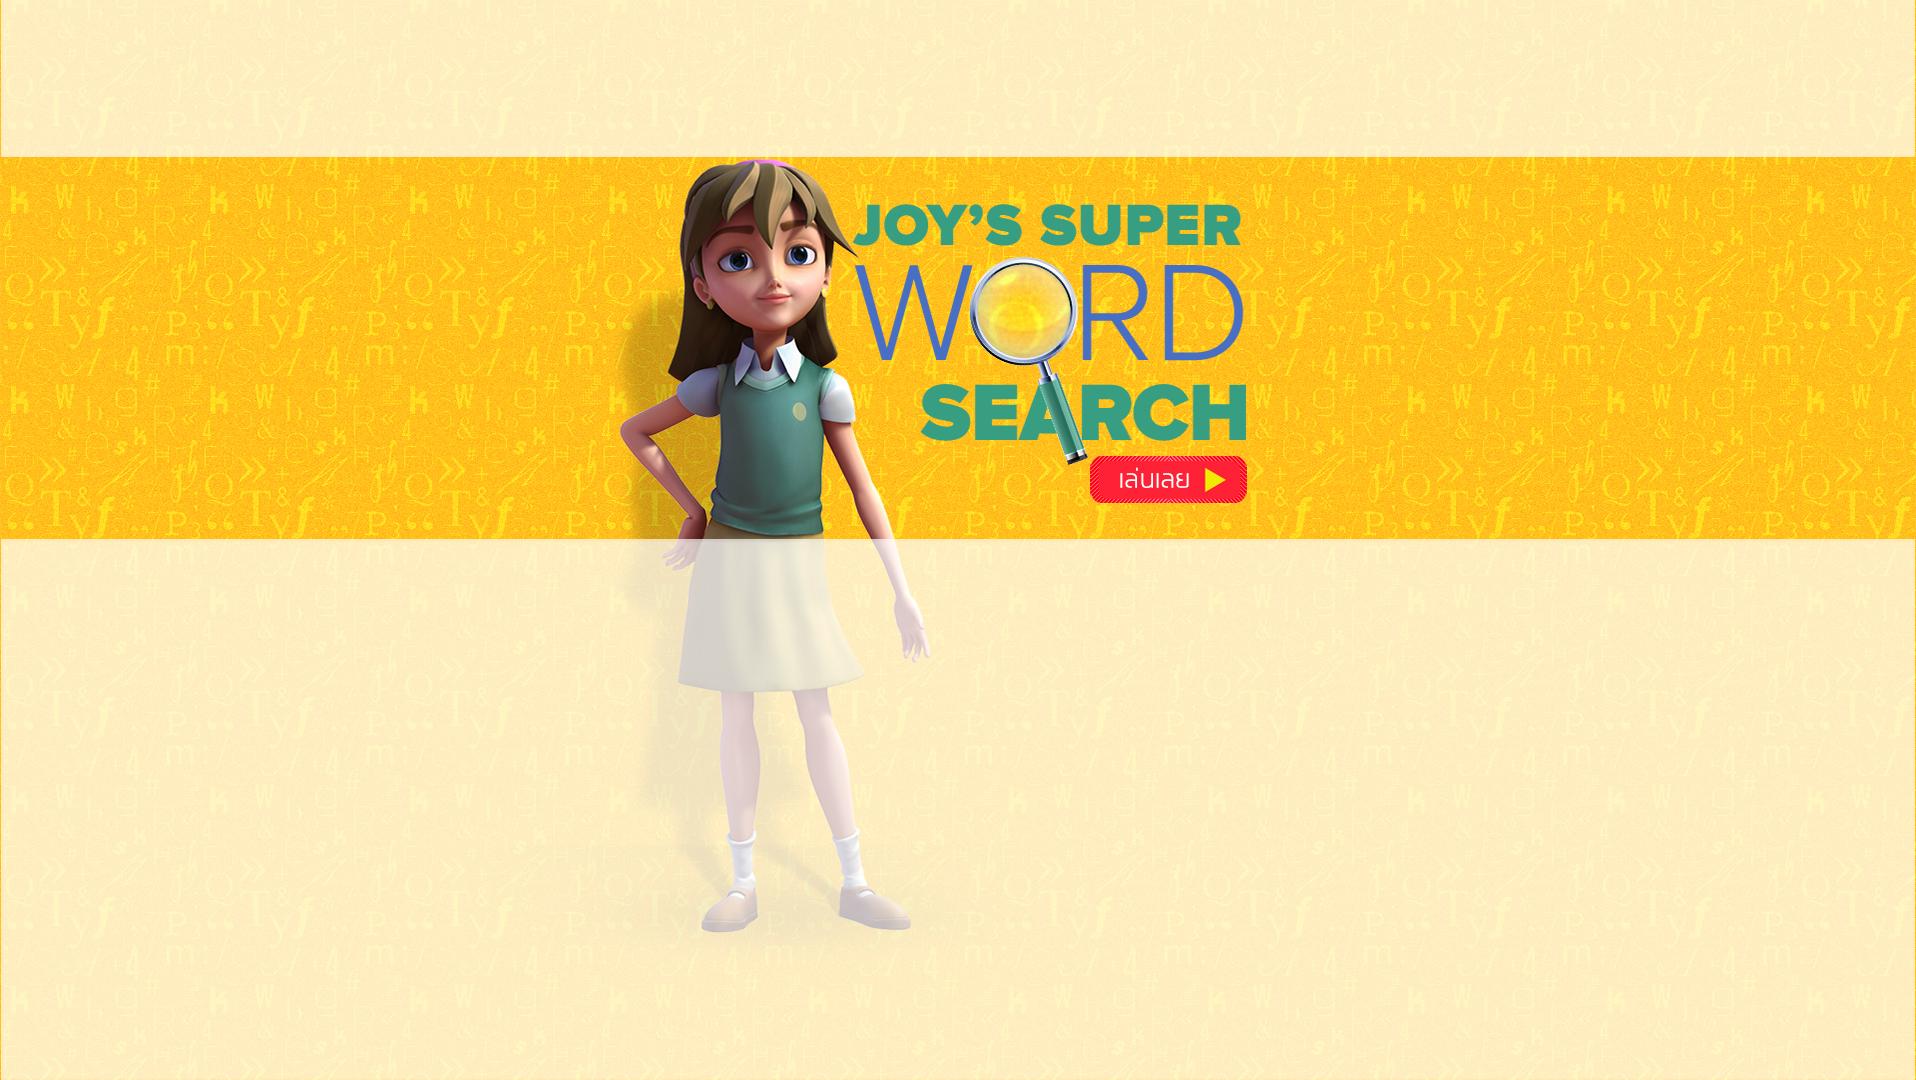 <h2>Joy's Super Word Search</h2>